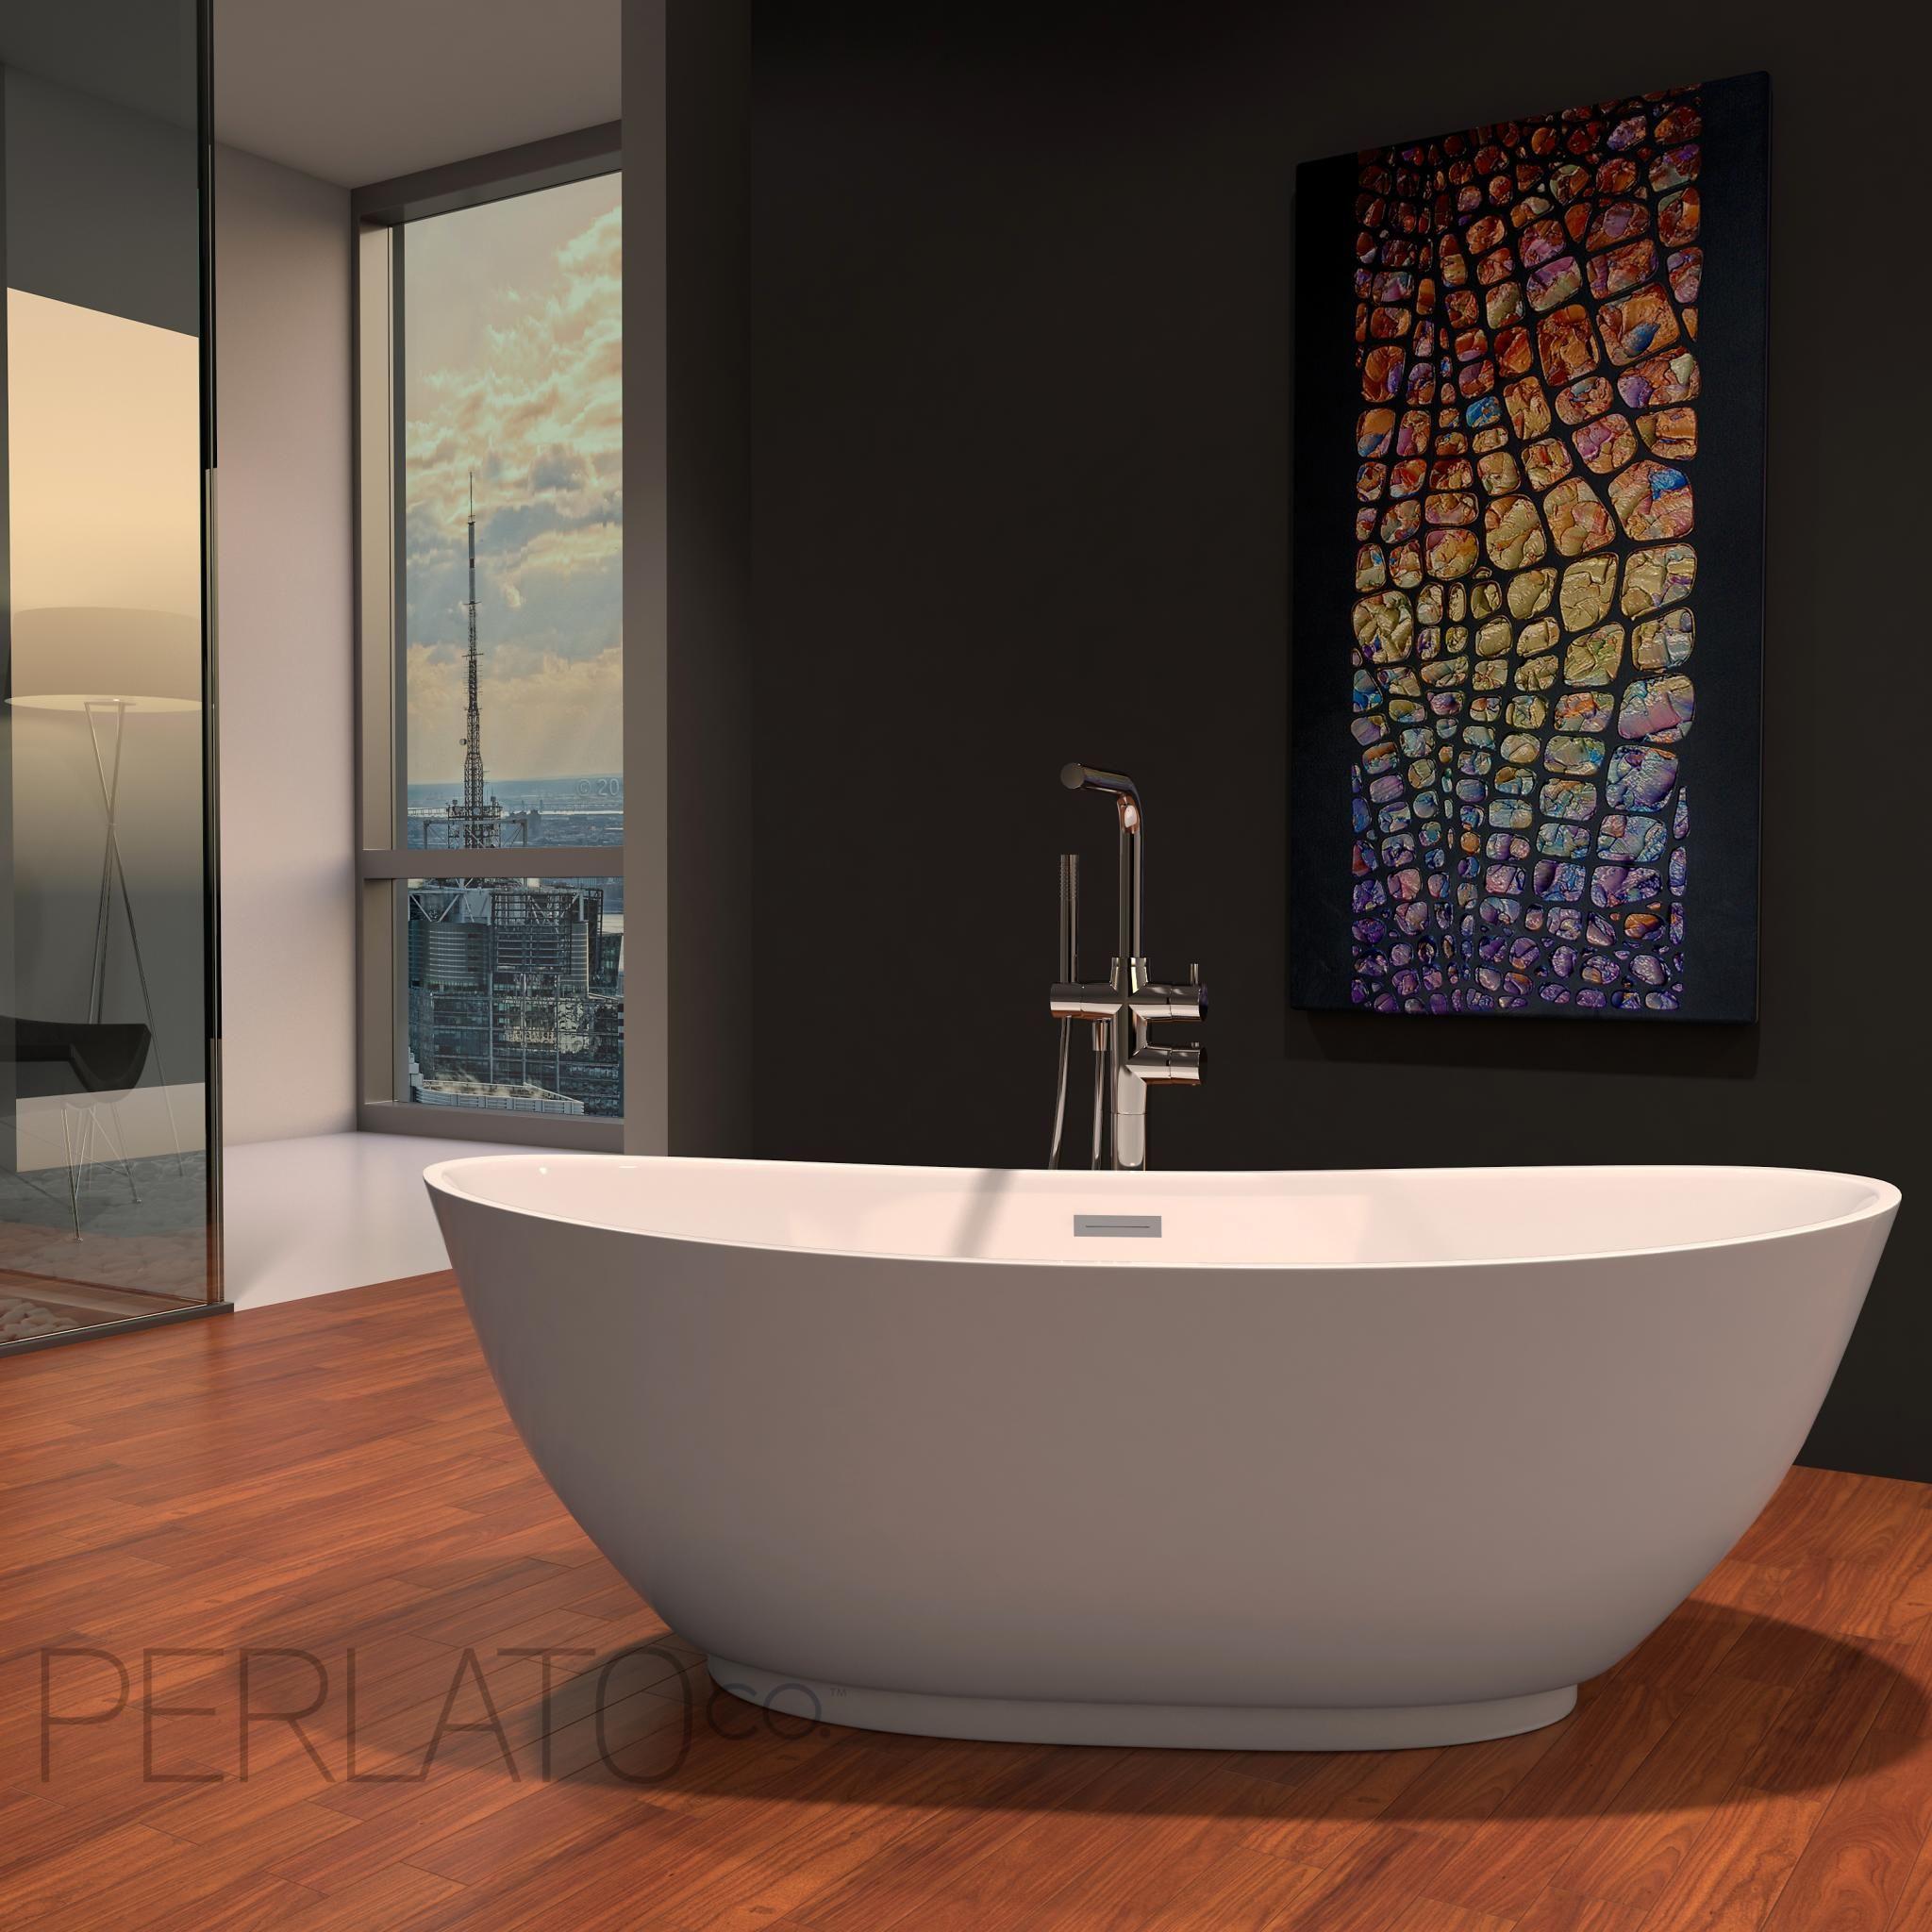 Roma Freestanding Soaker Tub | Bathe | Pinterest | Tubs